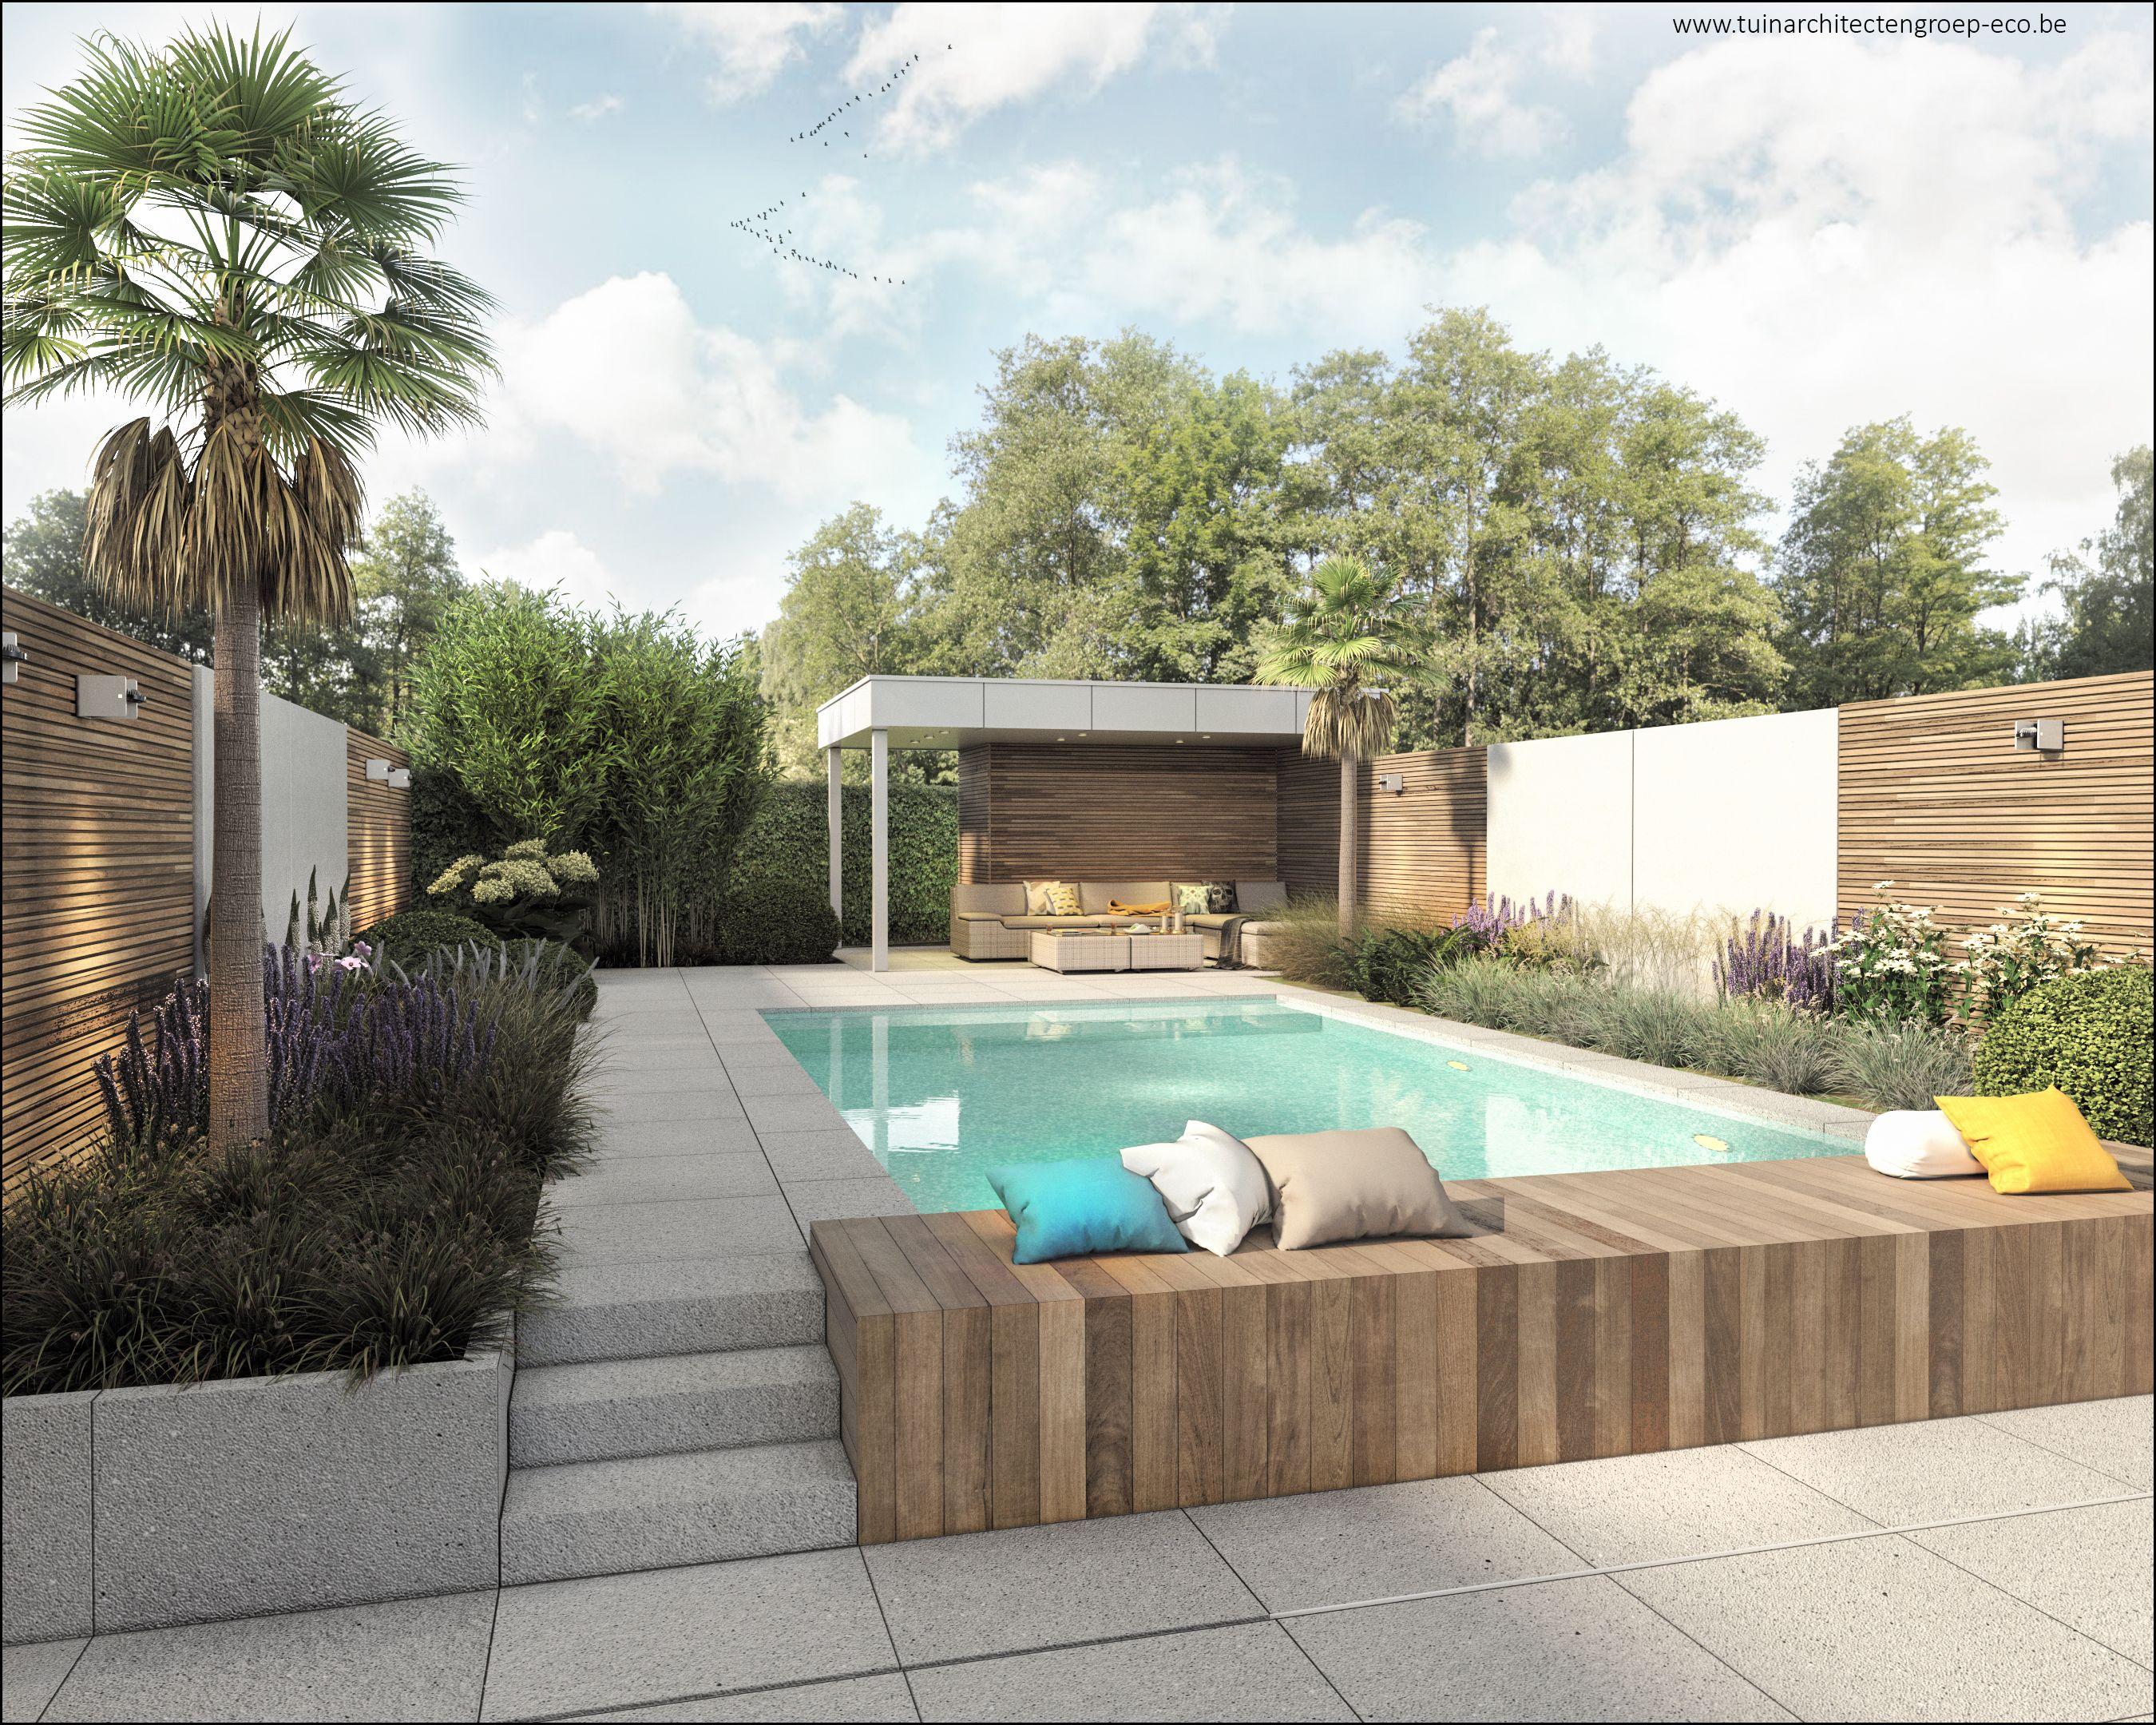 Tuinontwerp moderne tuin temse : vakantiegevoel #poolhouse #zwembad